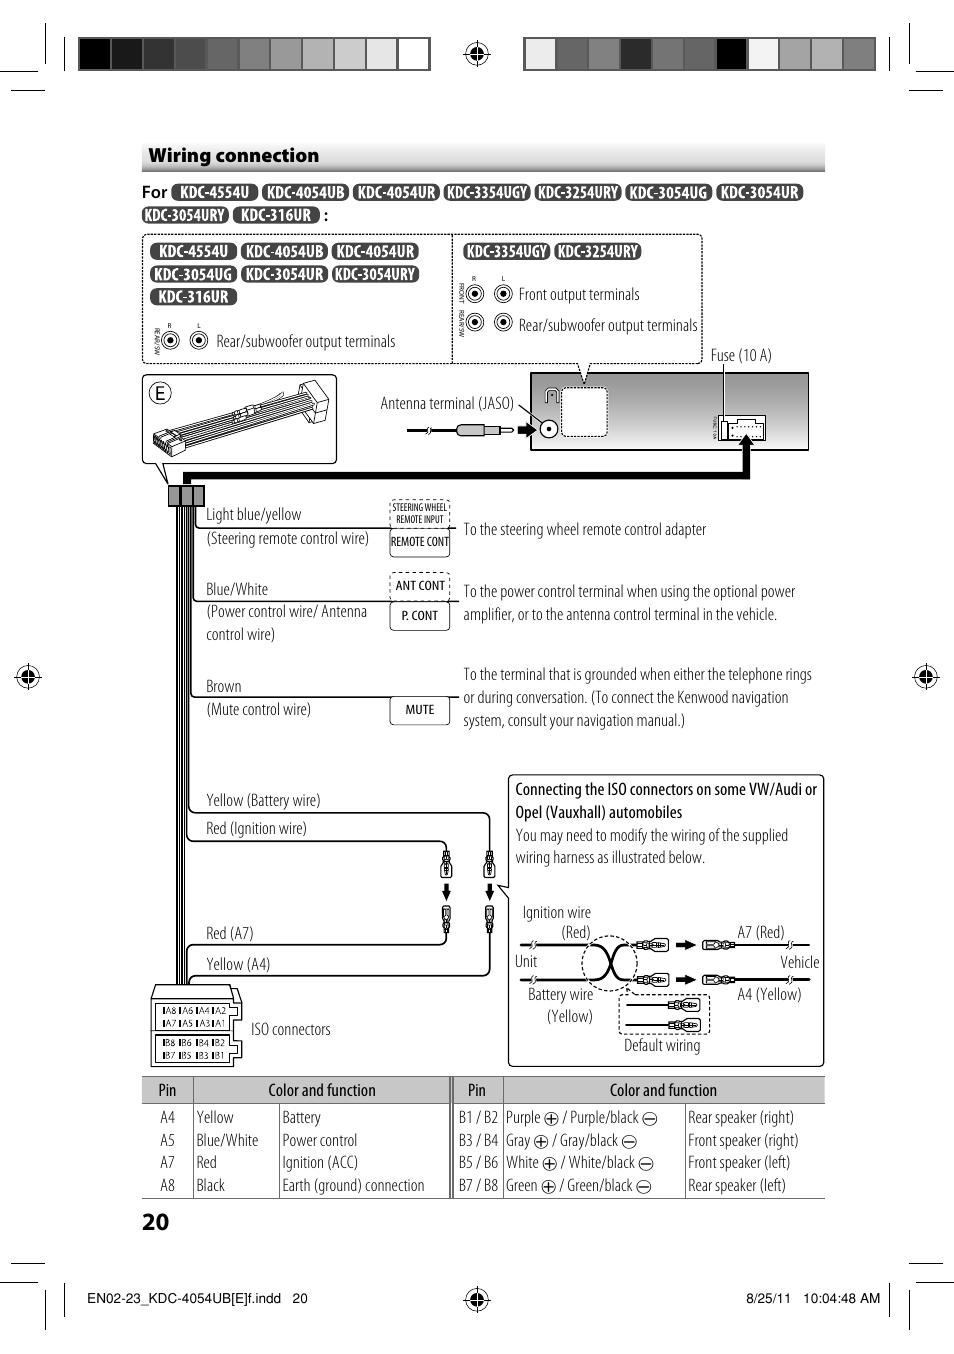 medium resolution of kenwood wiring harness mute harness kenwood wiring stereo kenwood radio wiring diagram kenwood kdc 205 wiring diagram